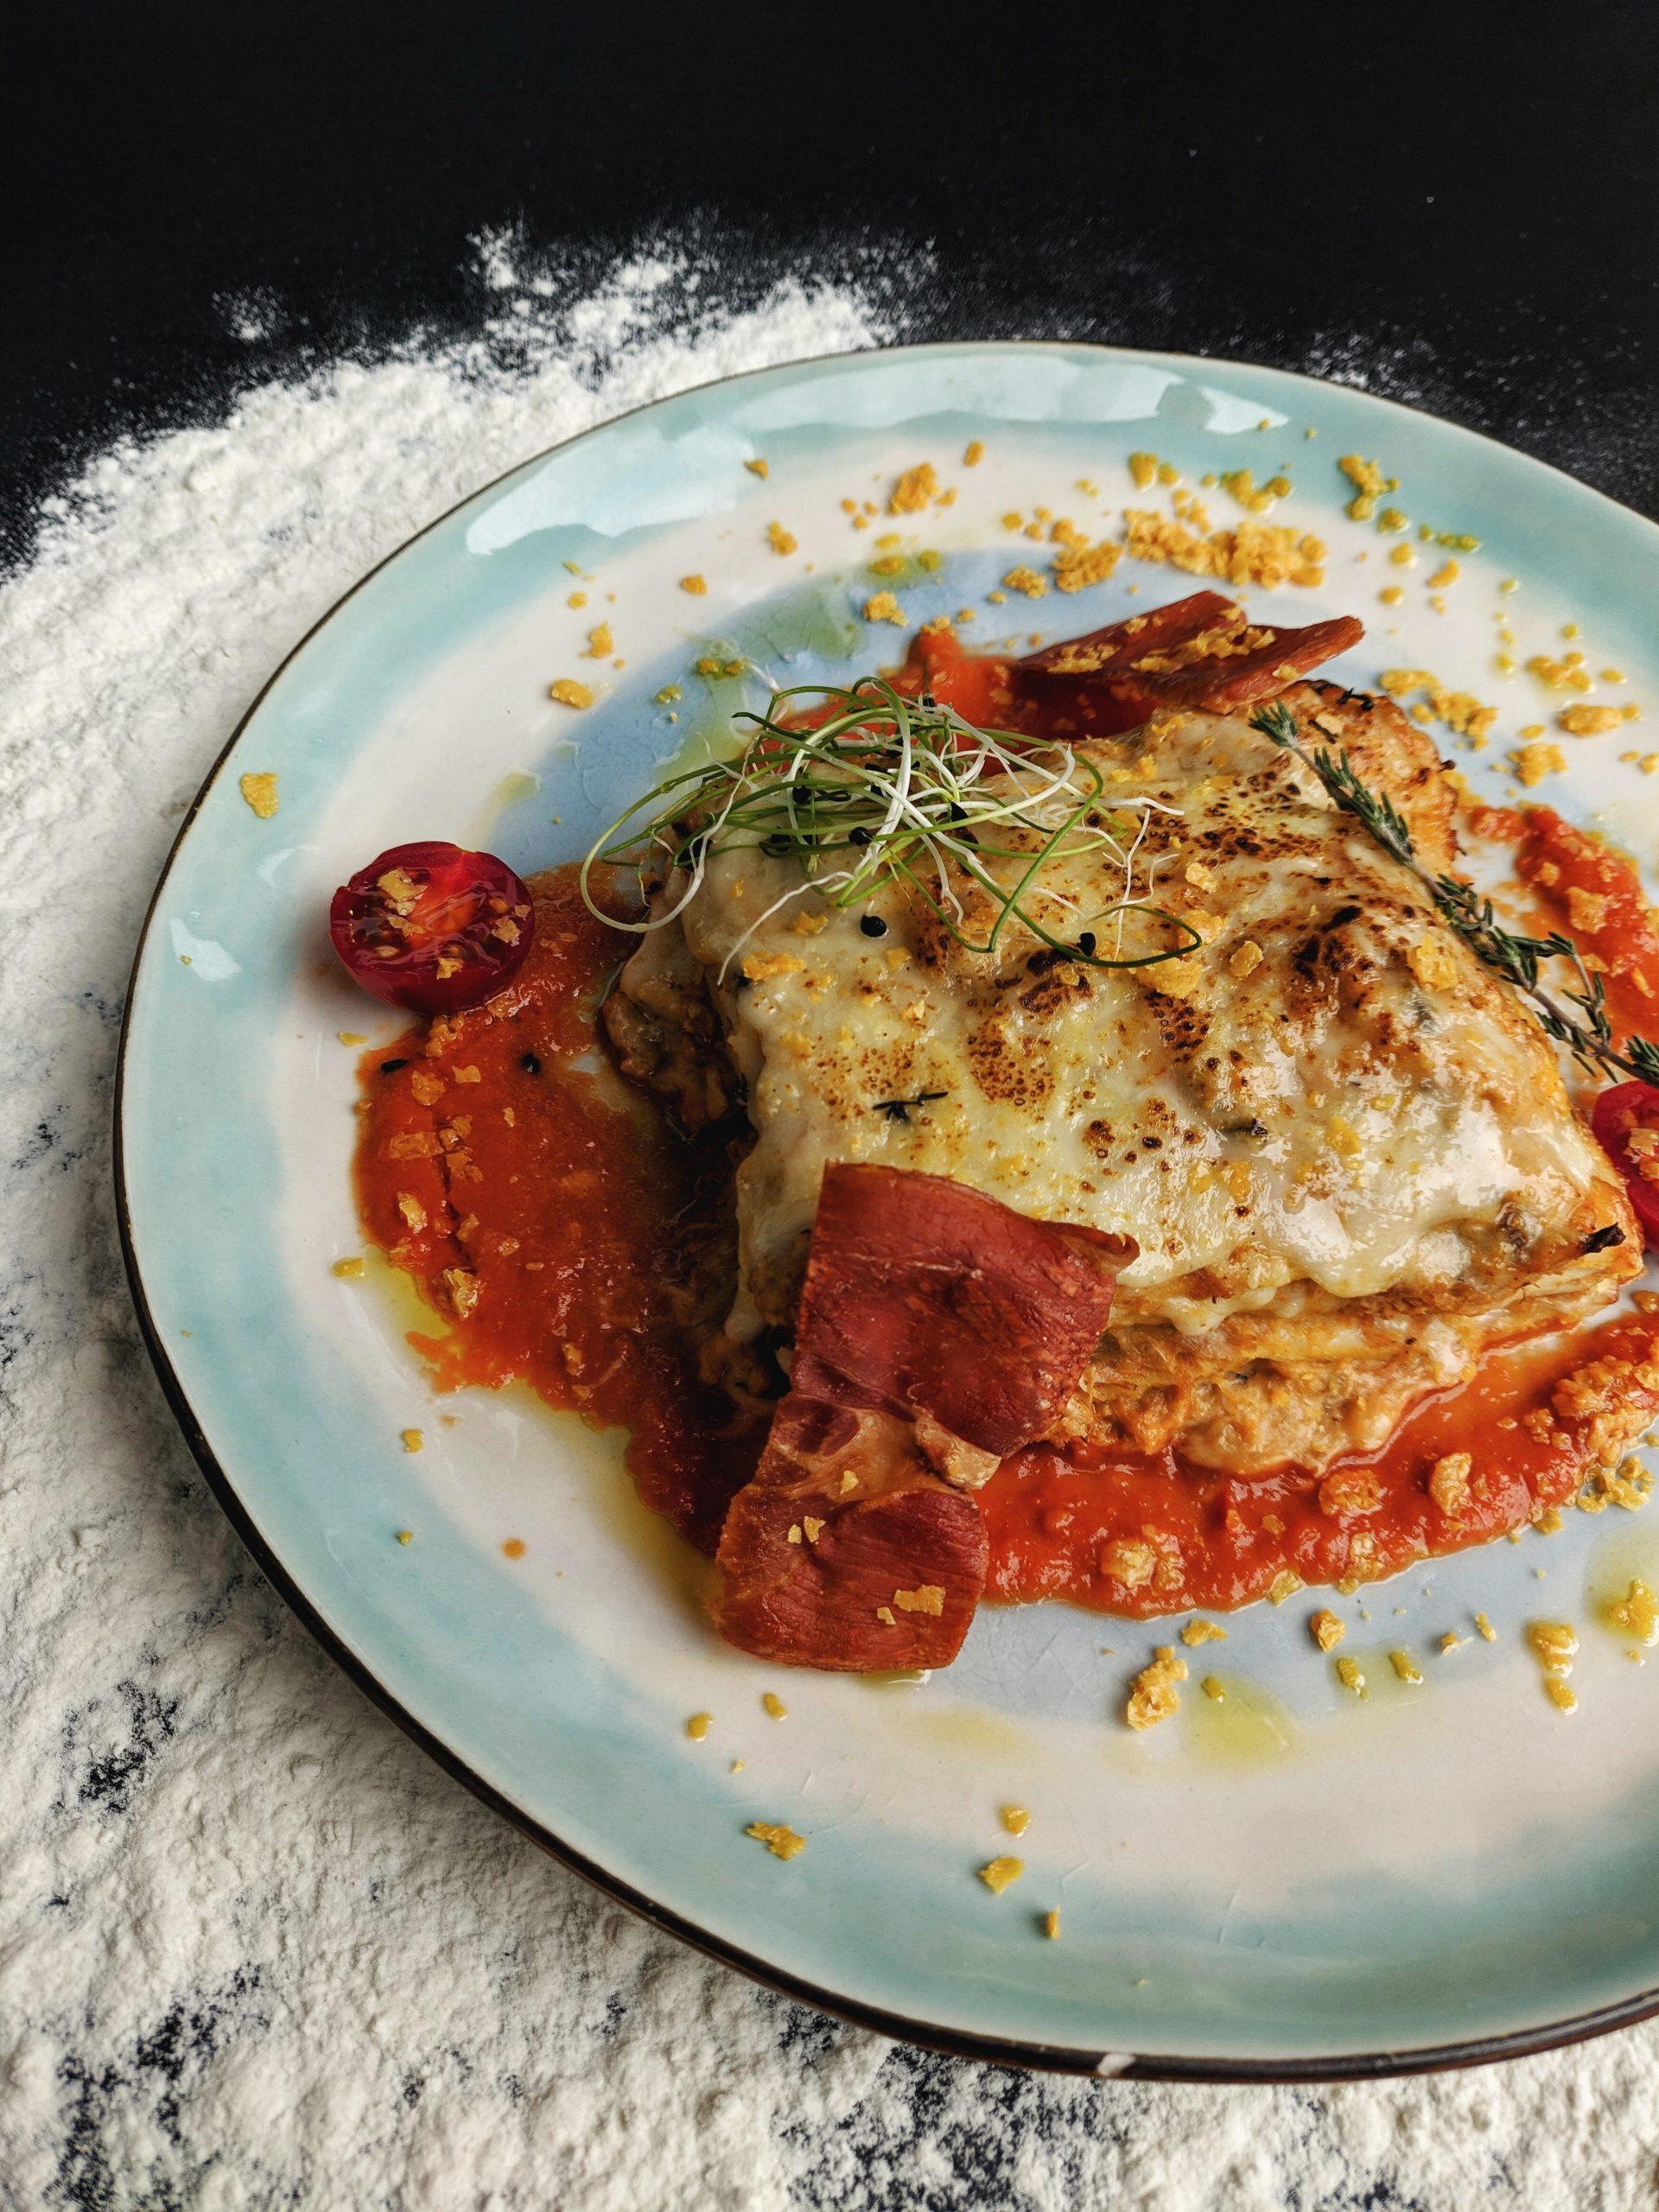 Pastisio, Greek Food, Greek Dishes, Greek cuisine, Food in Greece, traditional food in Greece, Greece desserts, Greece drinks